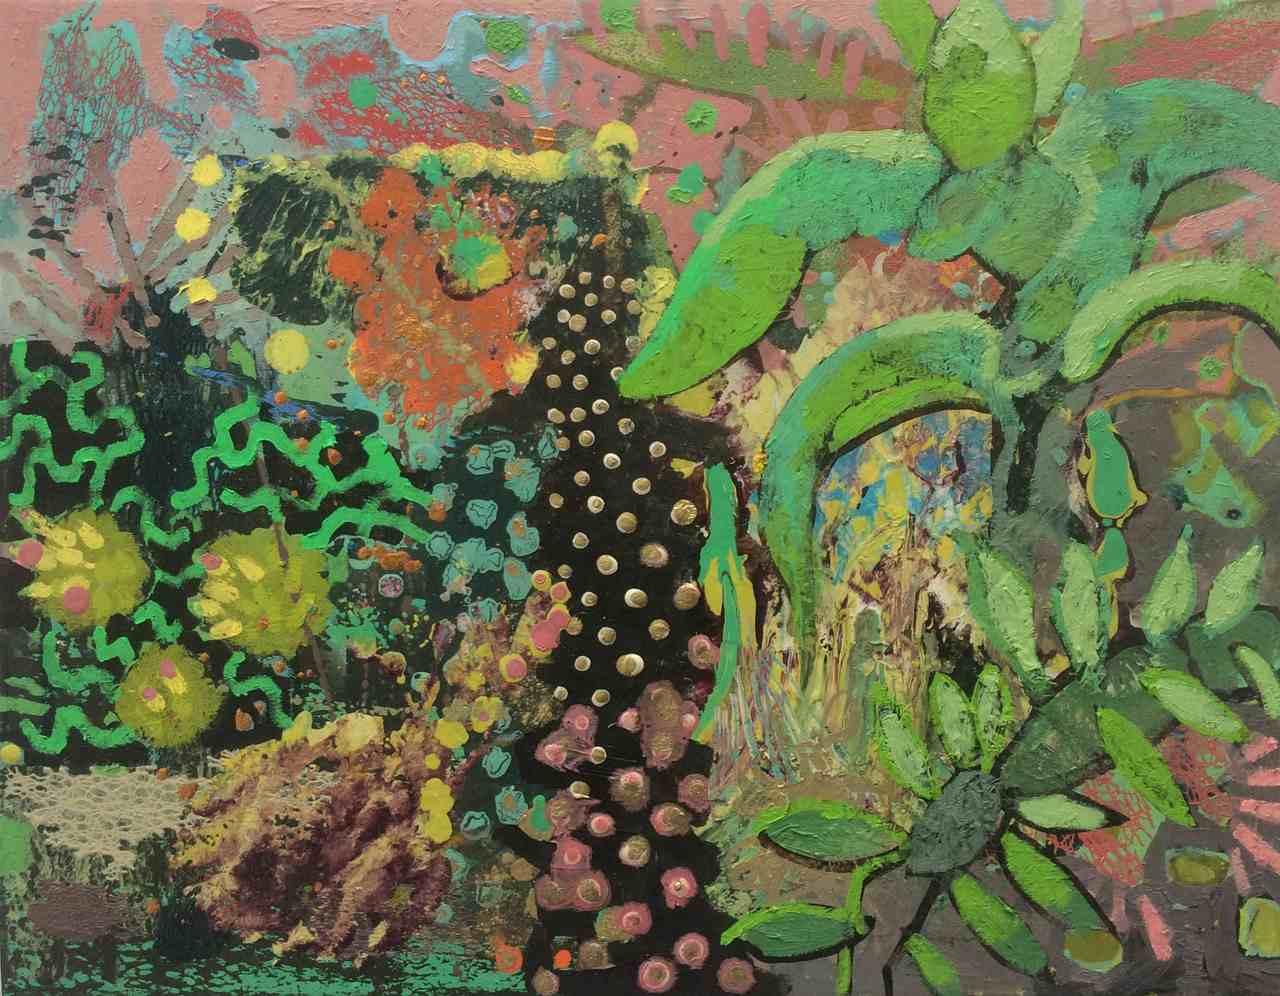 Frances Ryan, Botanic III, 35 x 45 cms, oil on canvas